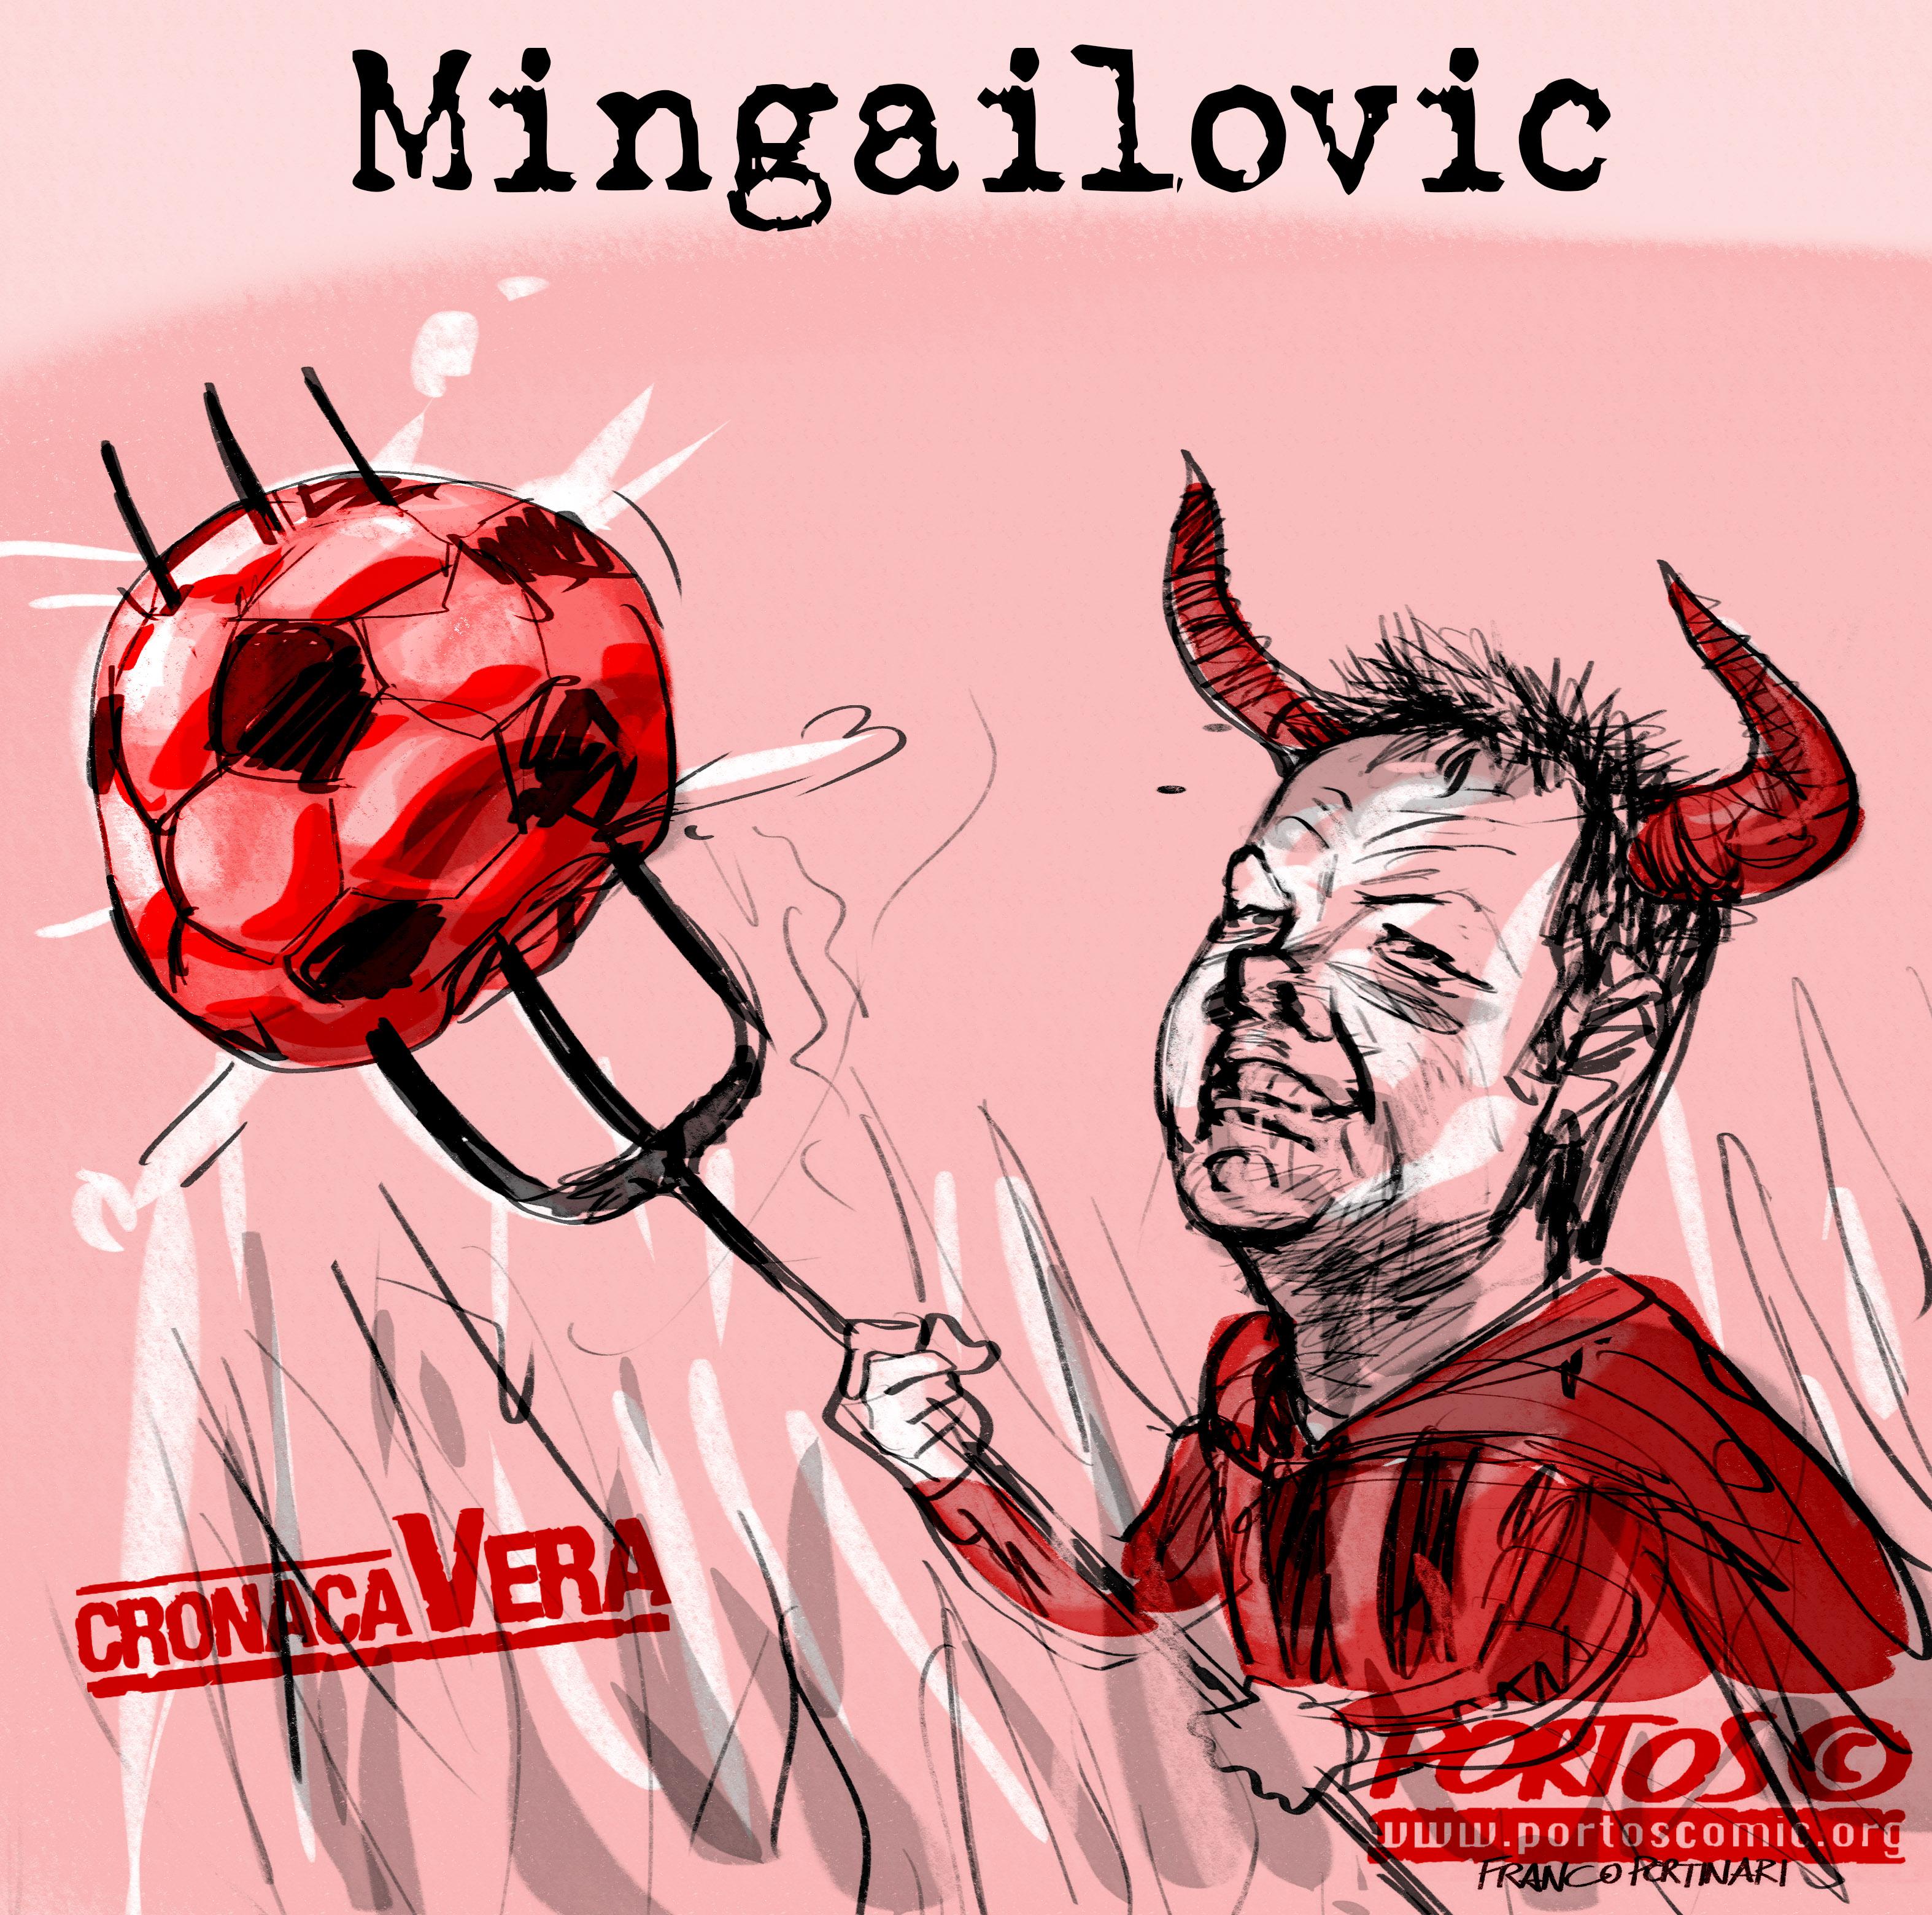 Mingailovic